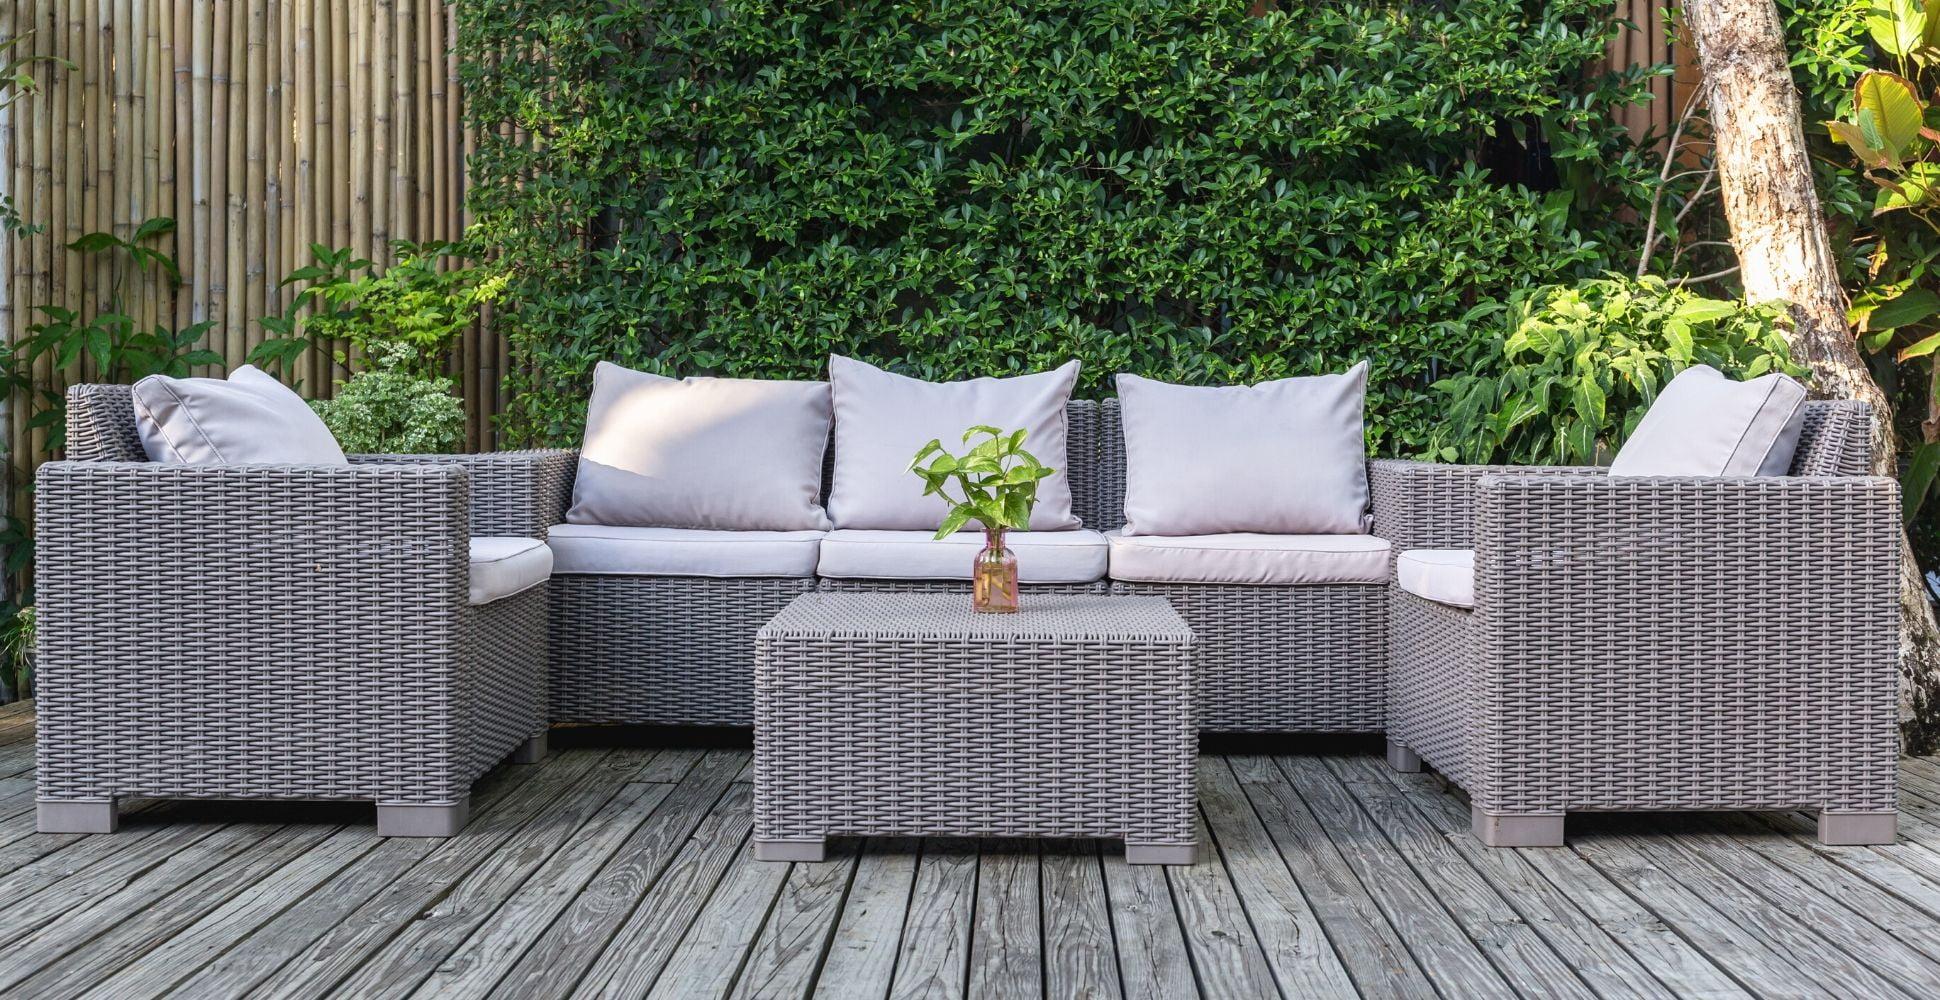 5 Best Grey Rattan Furniture Sets UK (Sept 2020 Review)